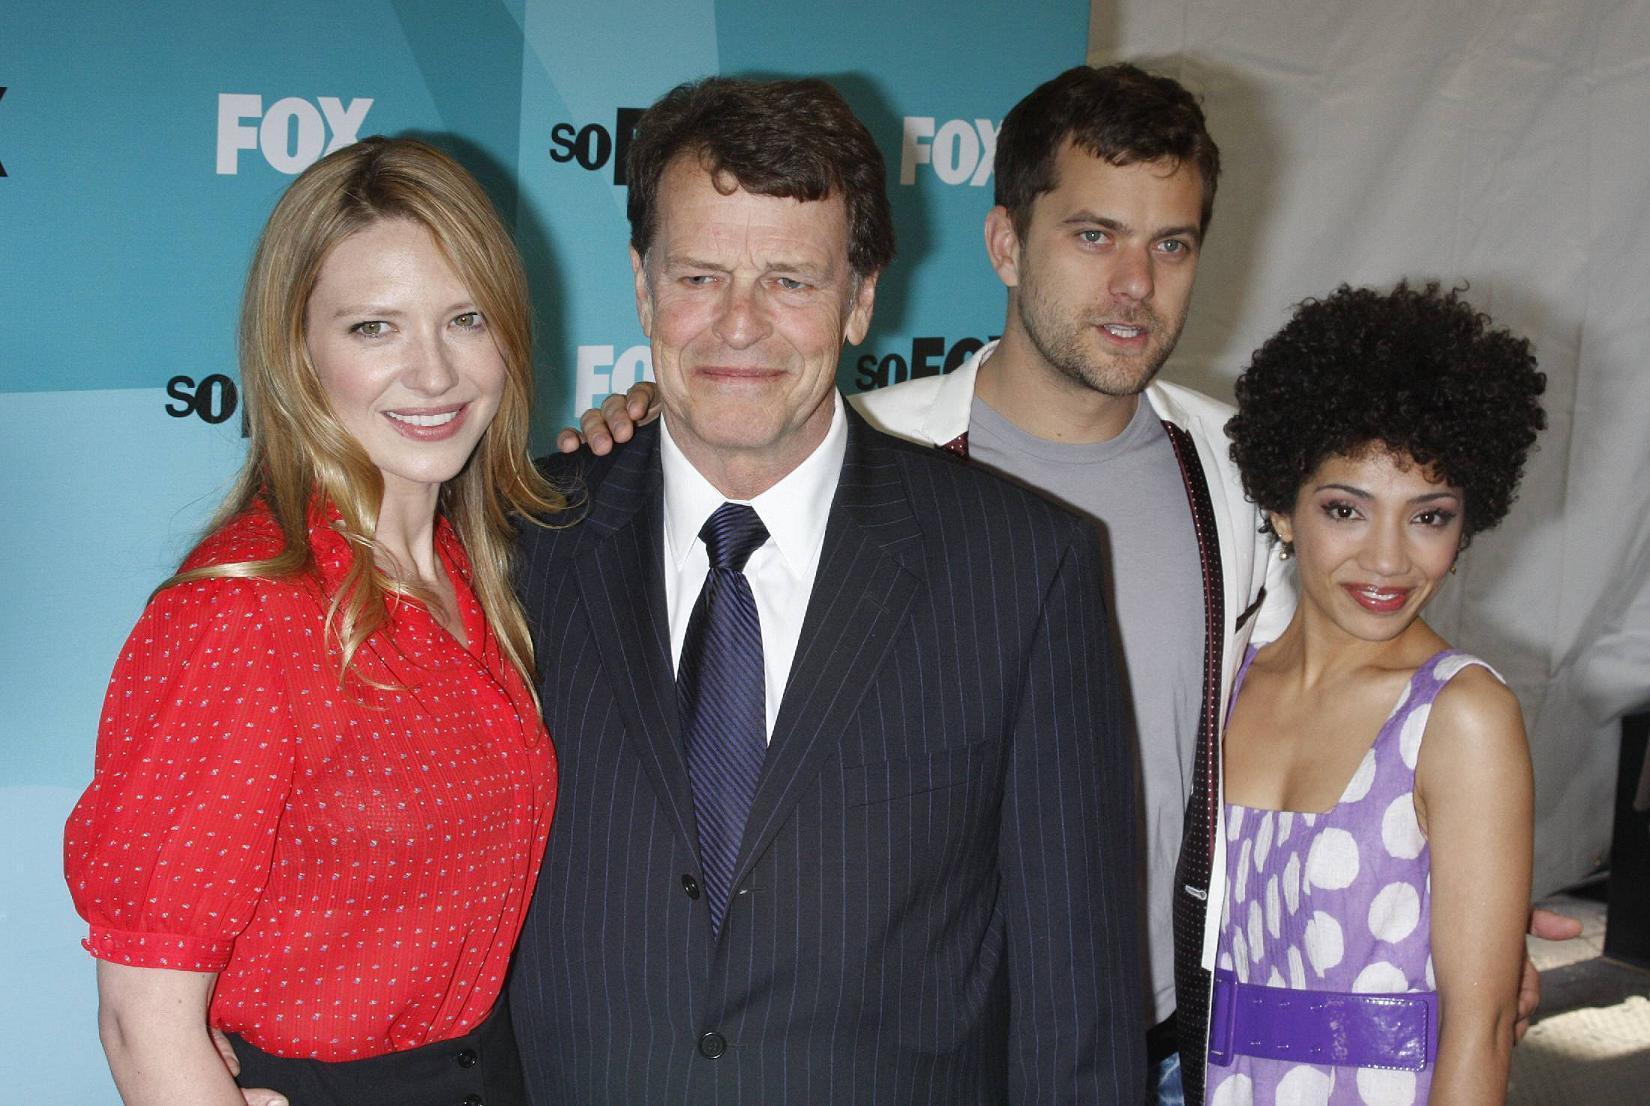 fox fringe castThe Fringe Cast at 2009 Fox Upfronts   Peter Bishop Photo  6347939 FnxaGqN9